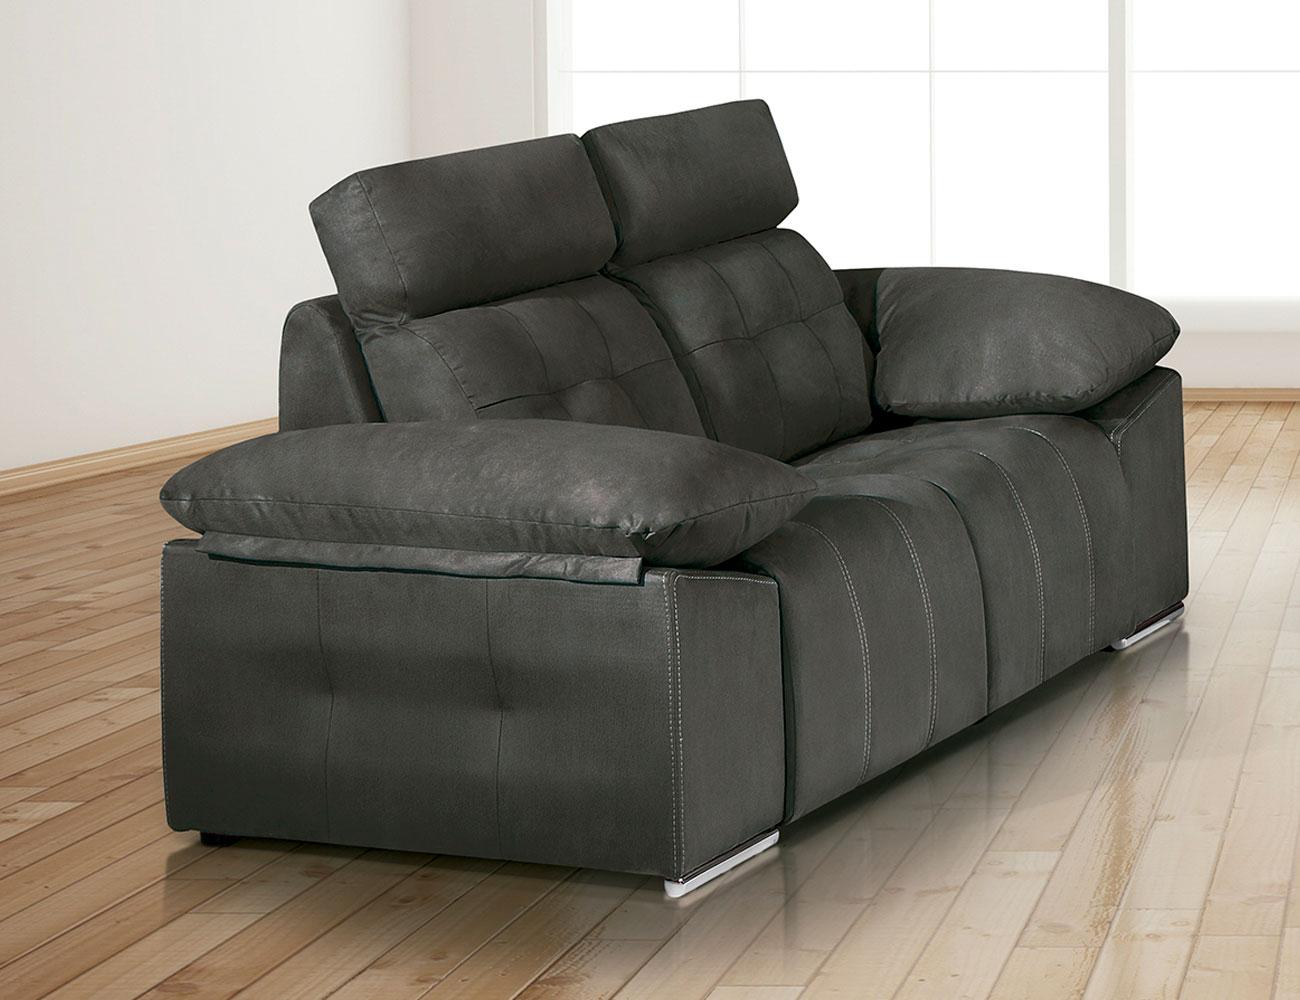 Sofa 2 plazas asientos capitone 180cm1